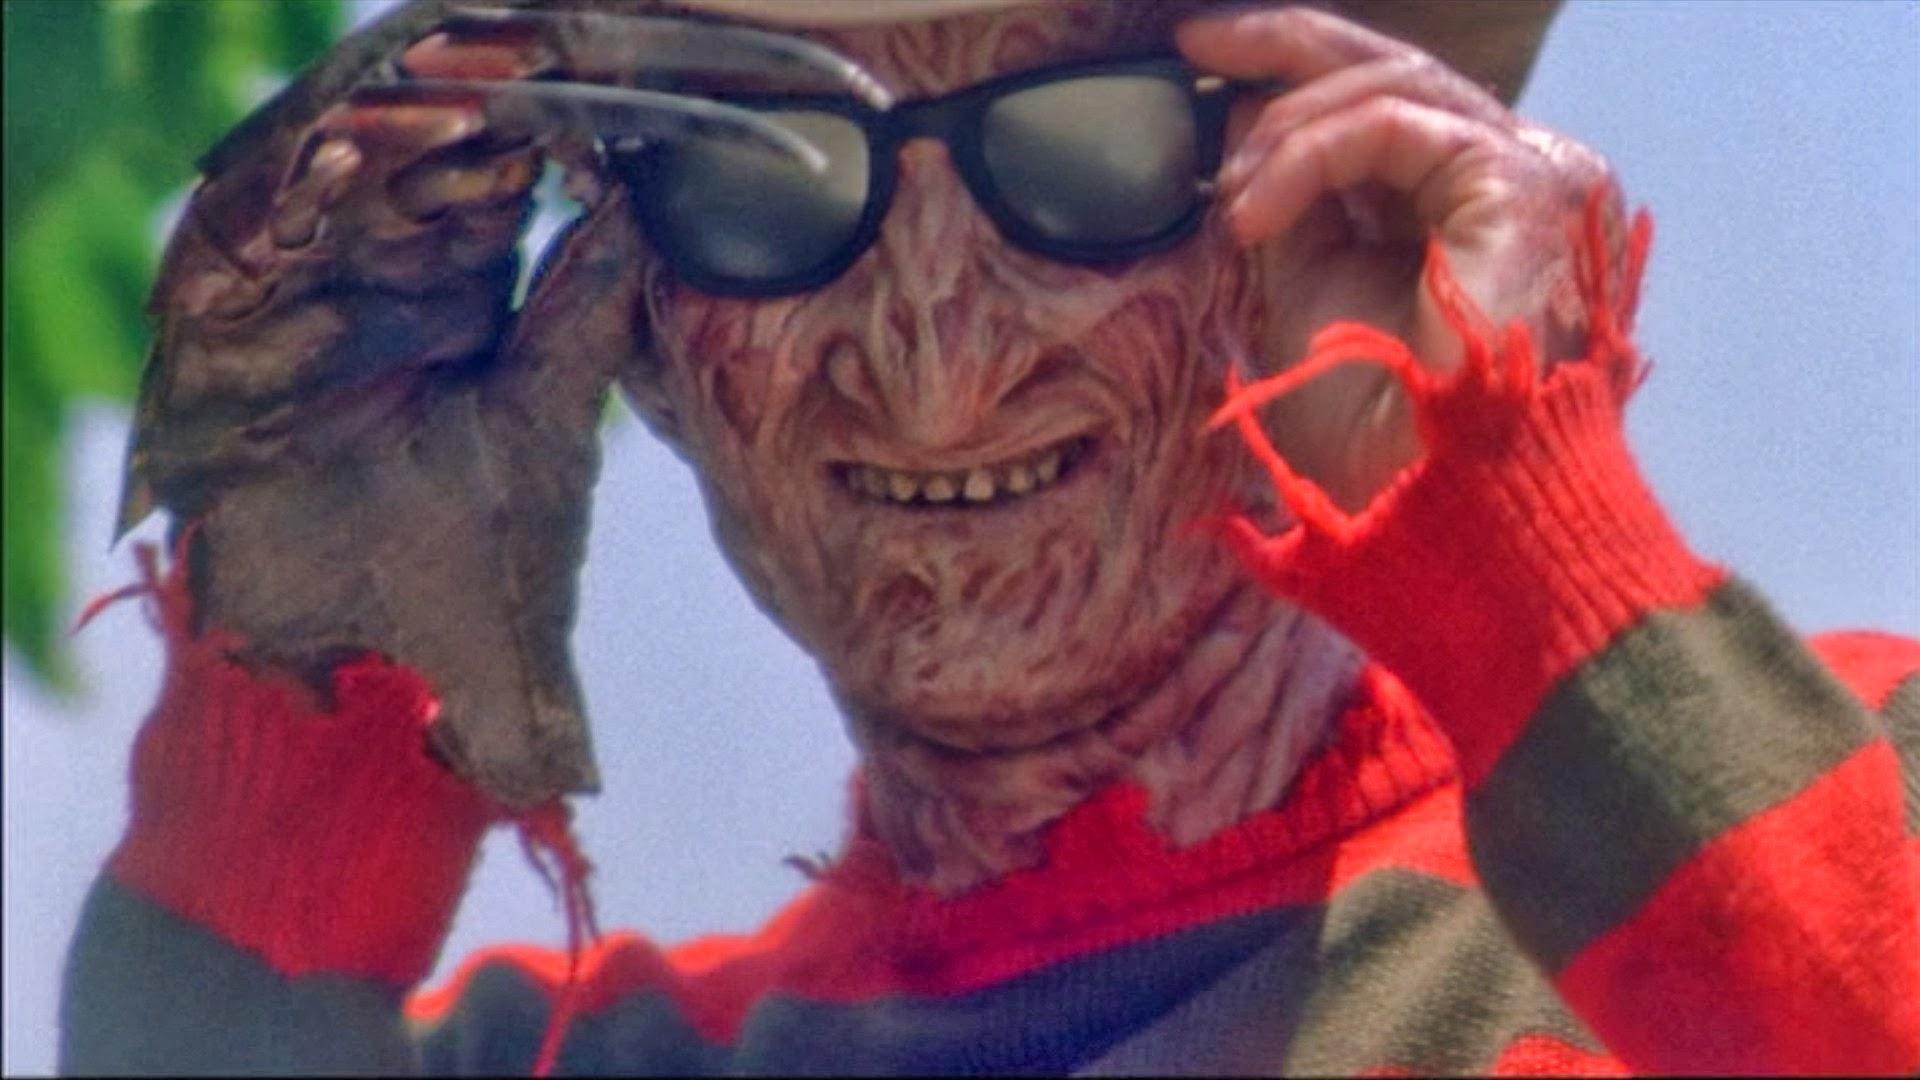 Horror Movie Wallpaper Hd 6 A Nightmare On Elm Street 4 The Dream Master Hd